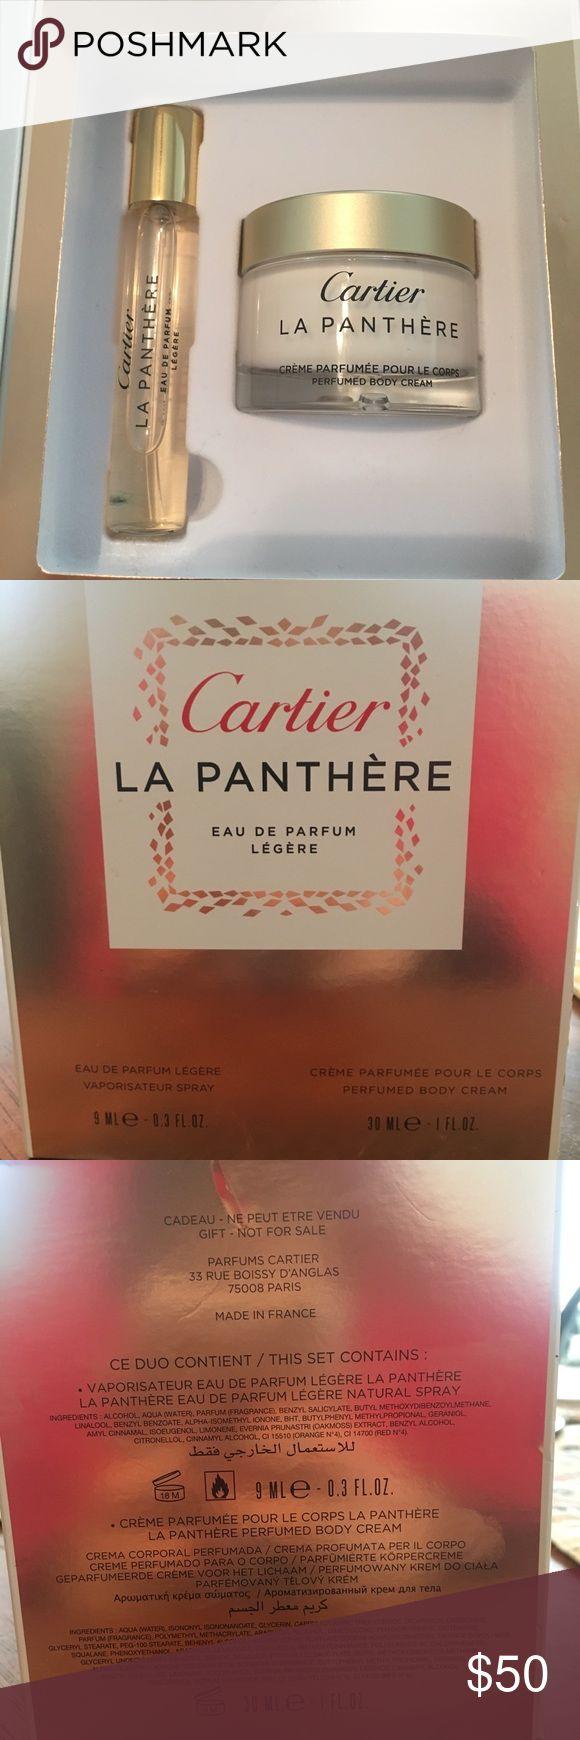 NWOT - Cartier La Panthère Eau De Parfum Cartier La Panthère Eau De Parfum Légère - with perfume and lotion! Unused, box has slight signs of wear. Perfect Holiday gift!  Vaporisateur Spray = 9ml Body Lotion = 30ml Cartier Other